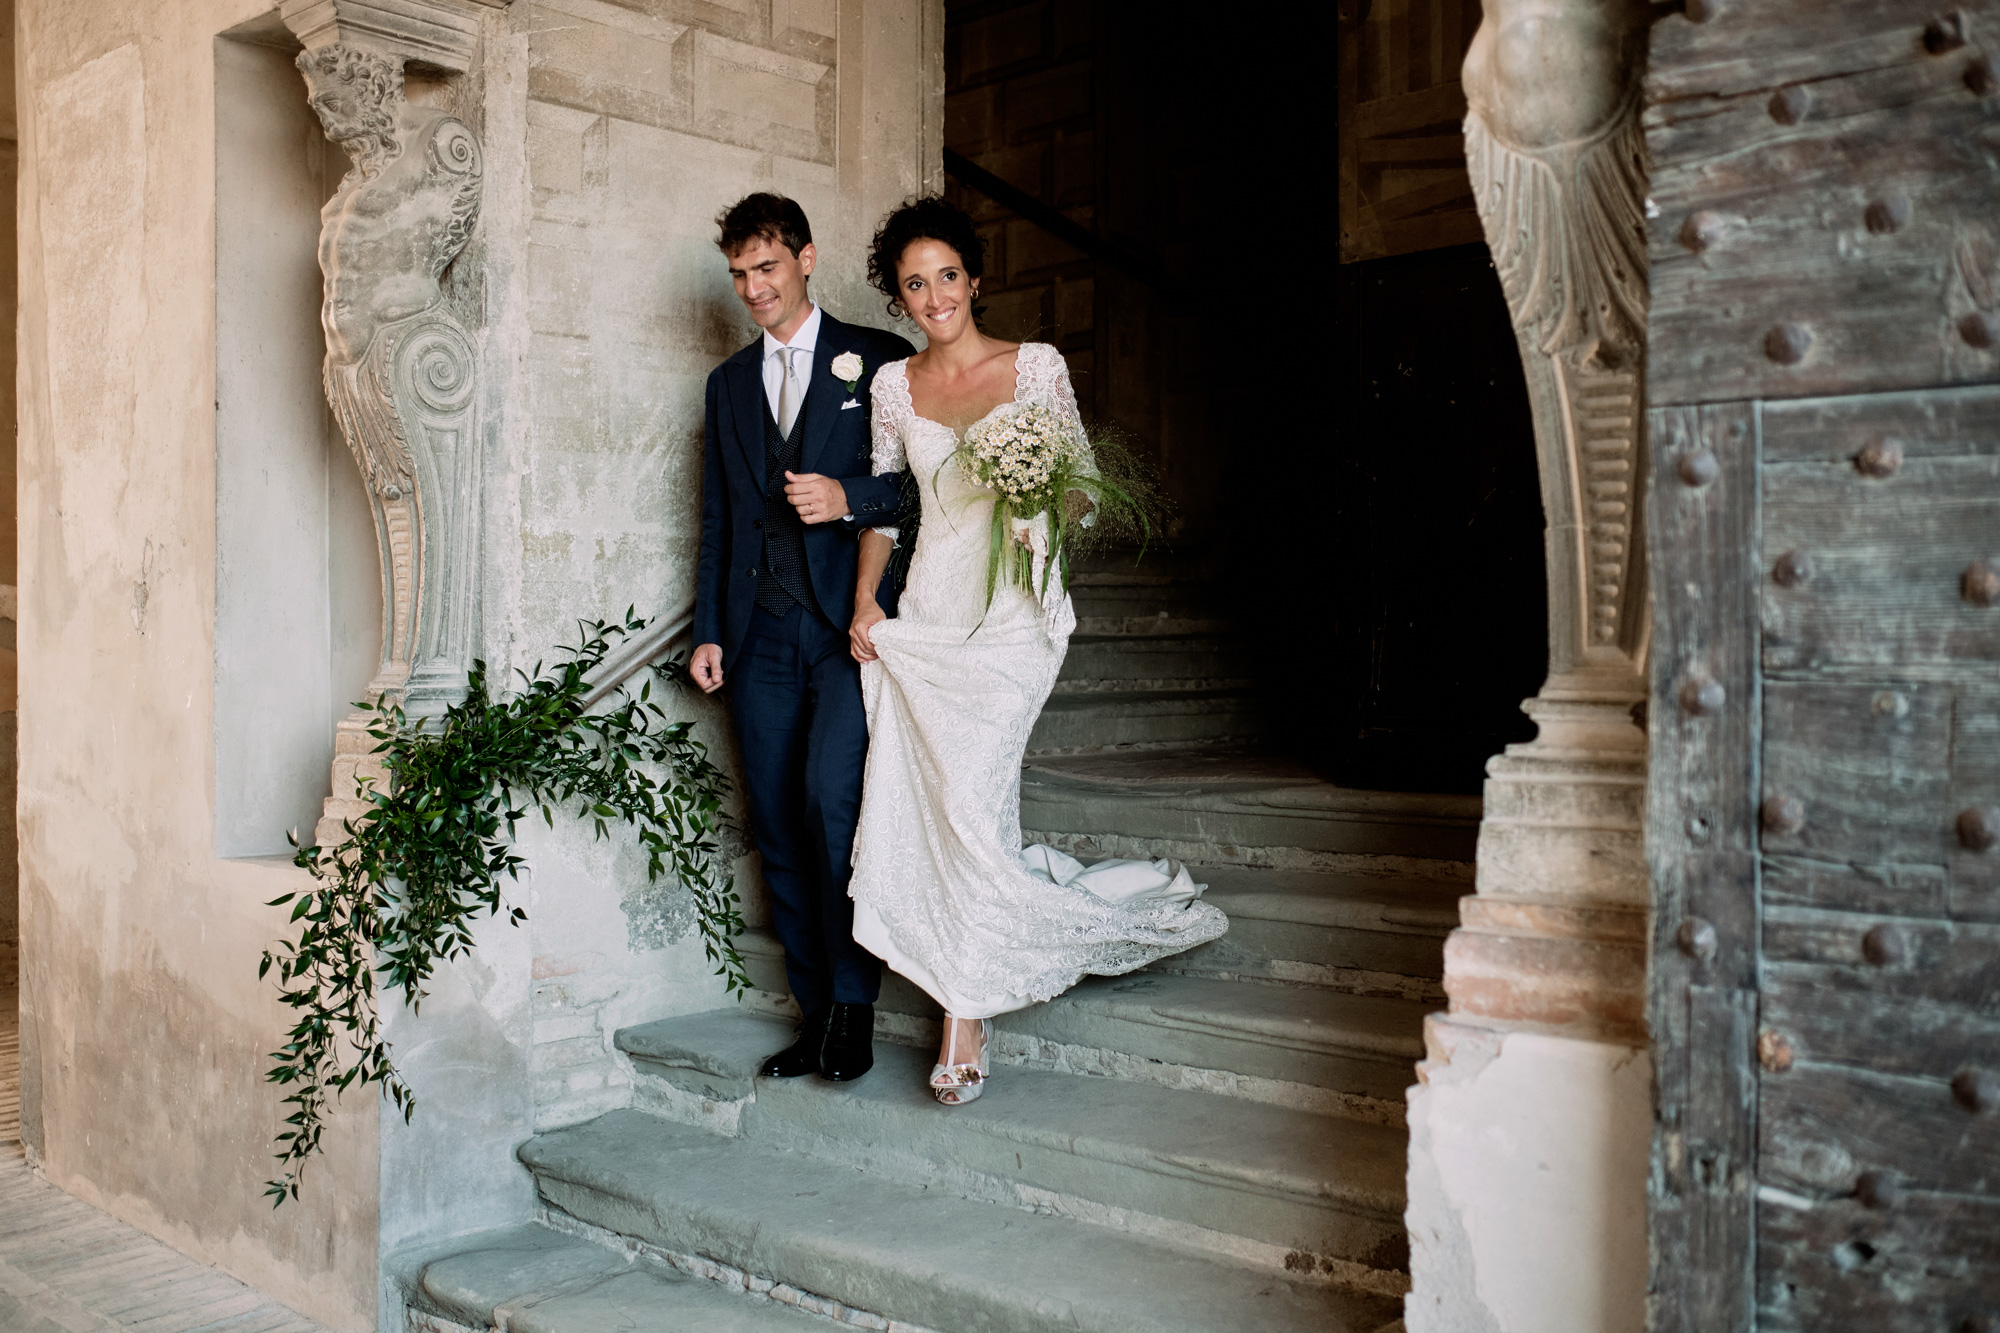 30-ivano_di_maria_fotografo_matrimonio_ margh_loren